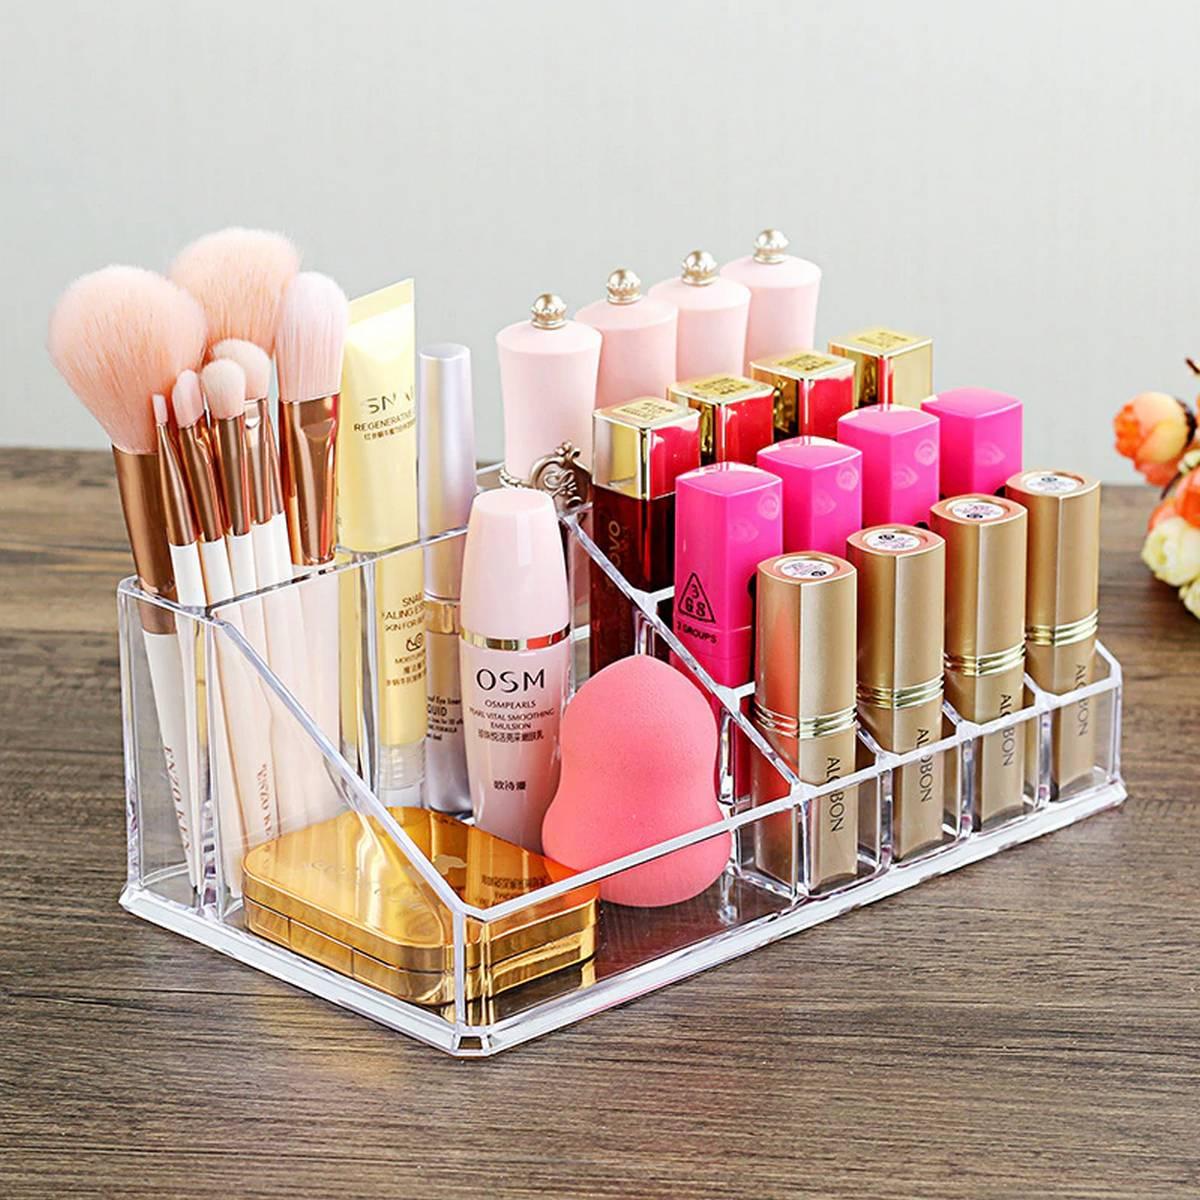 Acrylic makeup organizers Clear Storage Display Box Case Stand Rack Organizer Jewelry Storage Lipstick make-up brush Holder